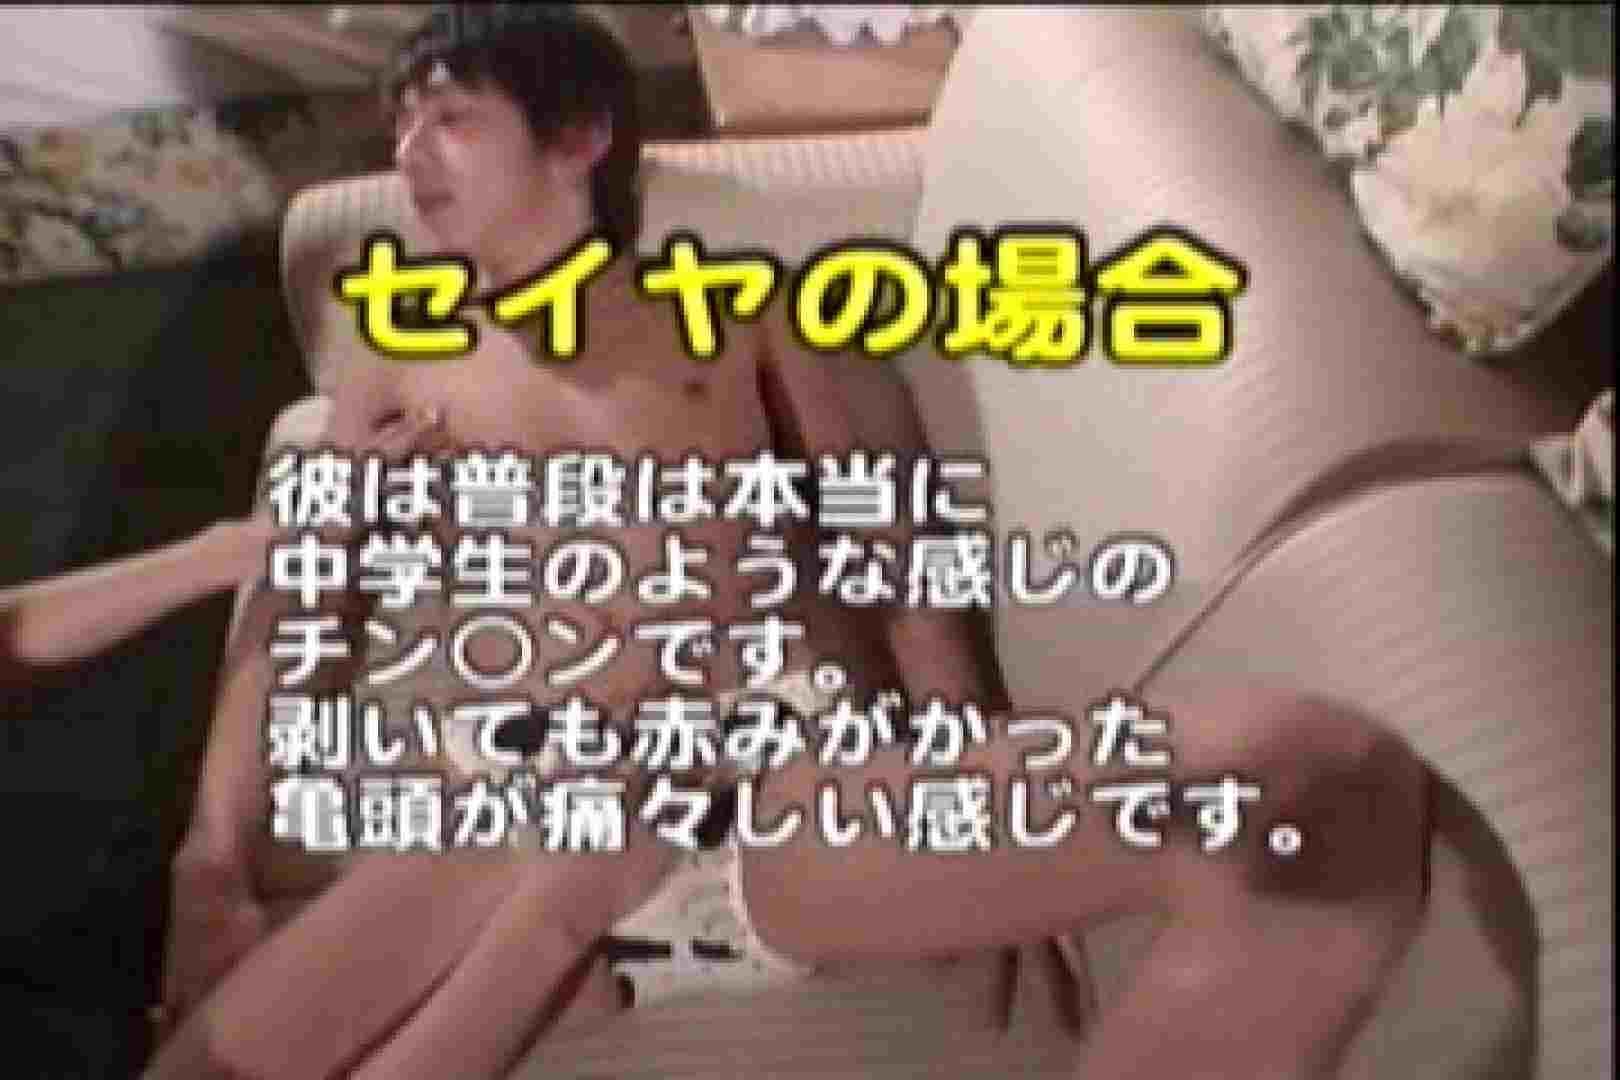 BABY FACEな包茎事情!!4FACEの快楽 フェラ ゲイ素人エロ画像 104枚 29